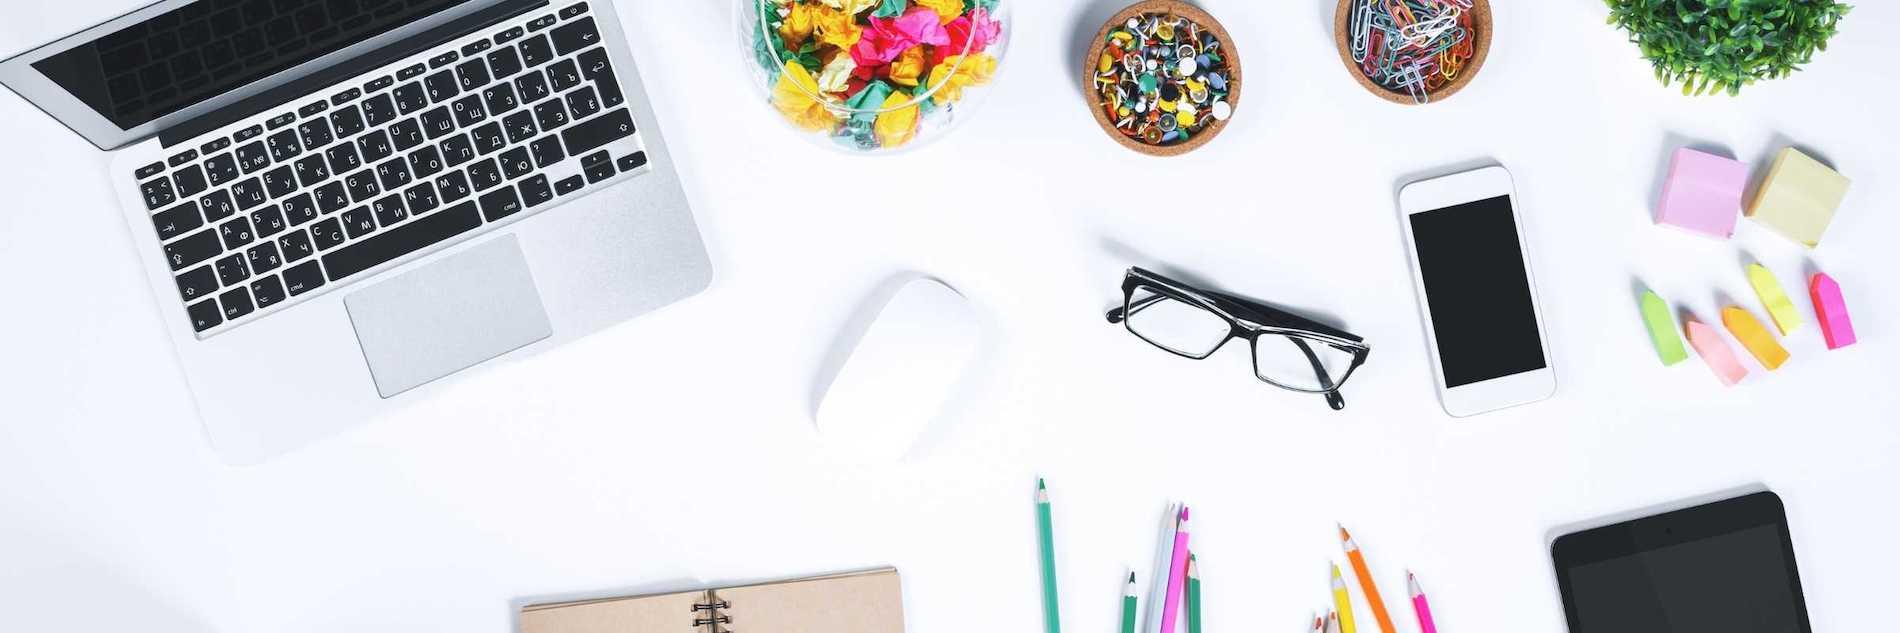 Creative business desk